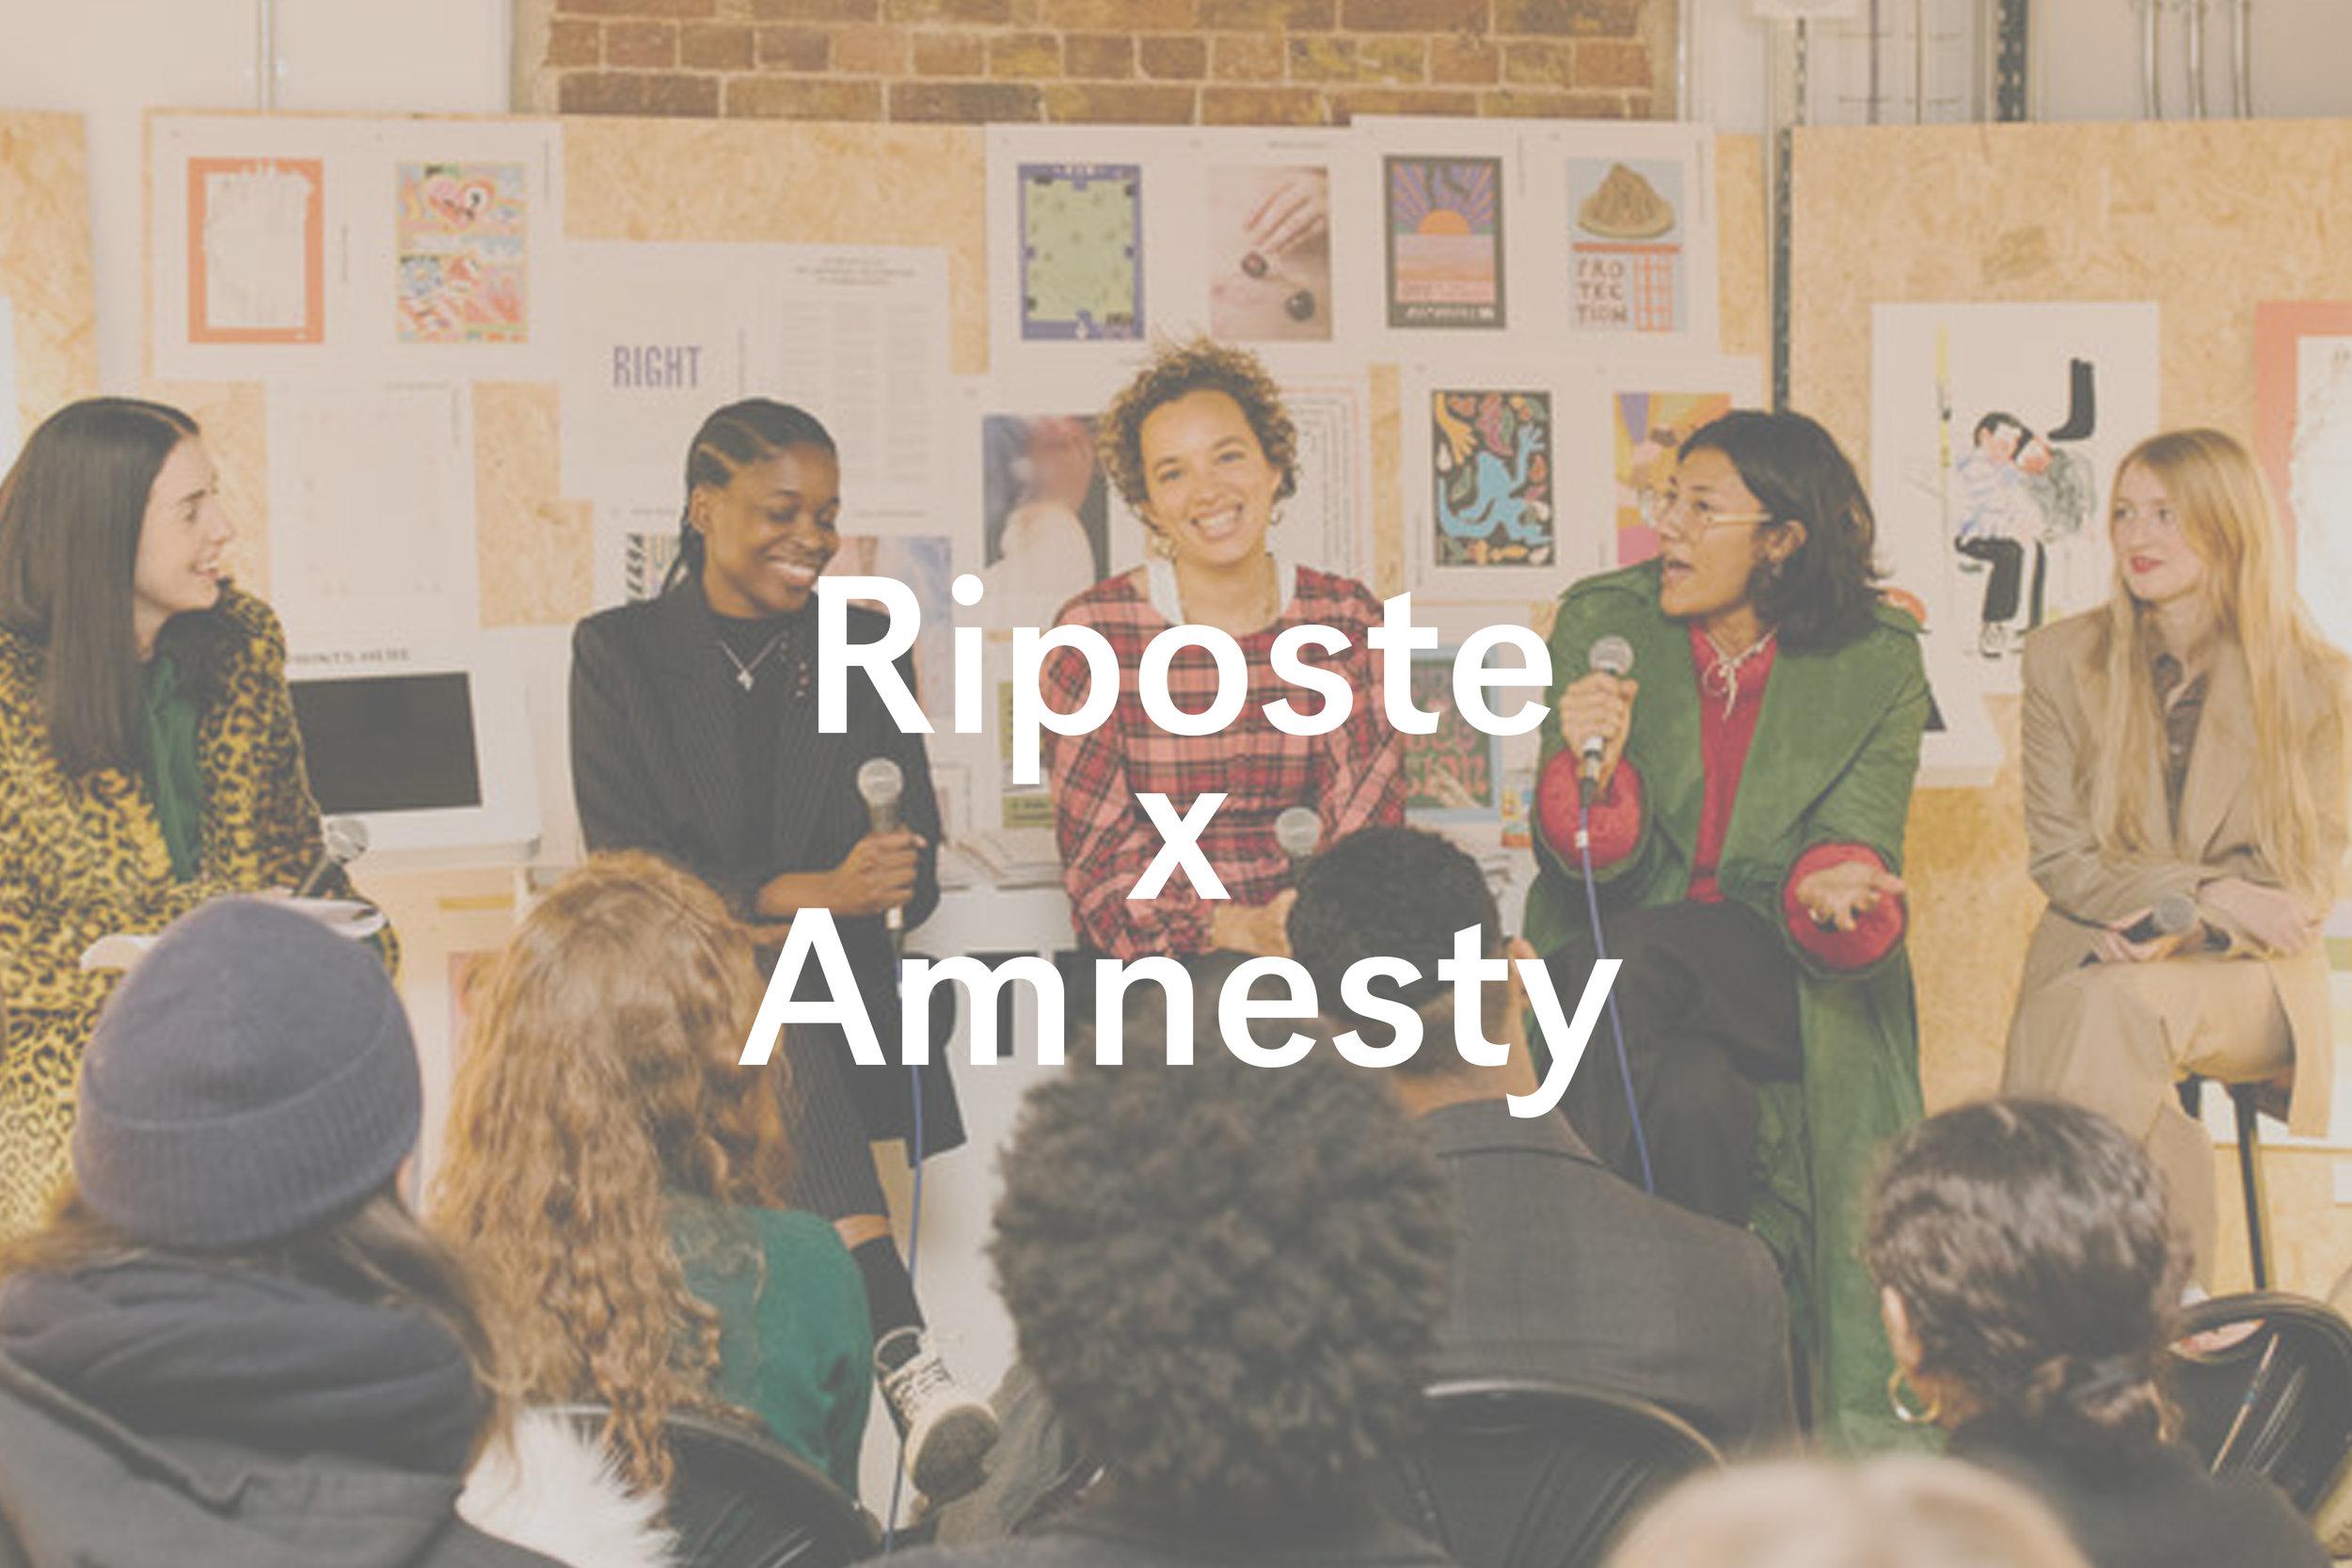 Amnesty Cover cover.jpg